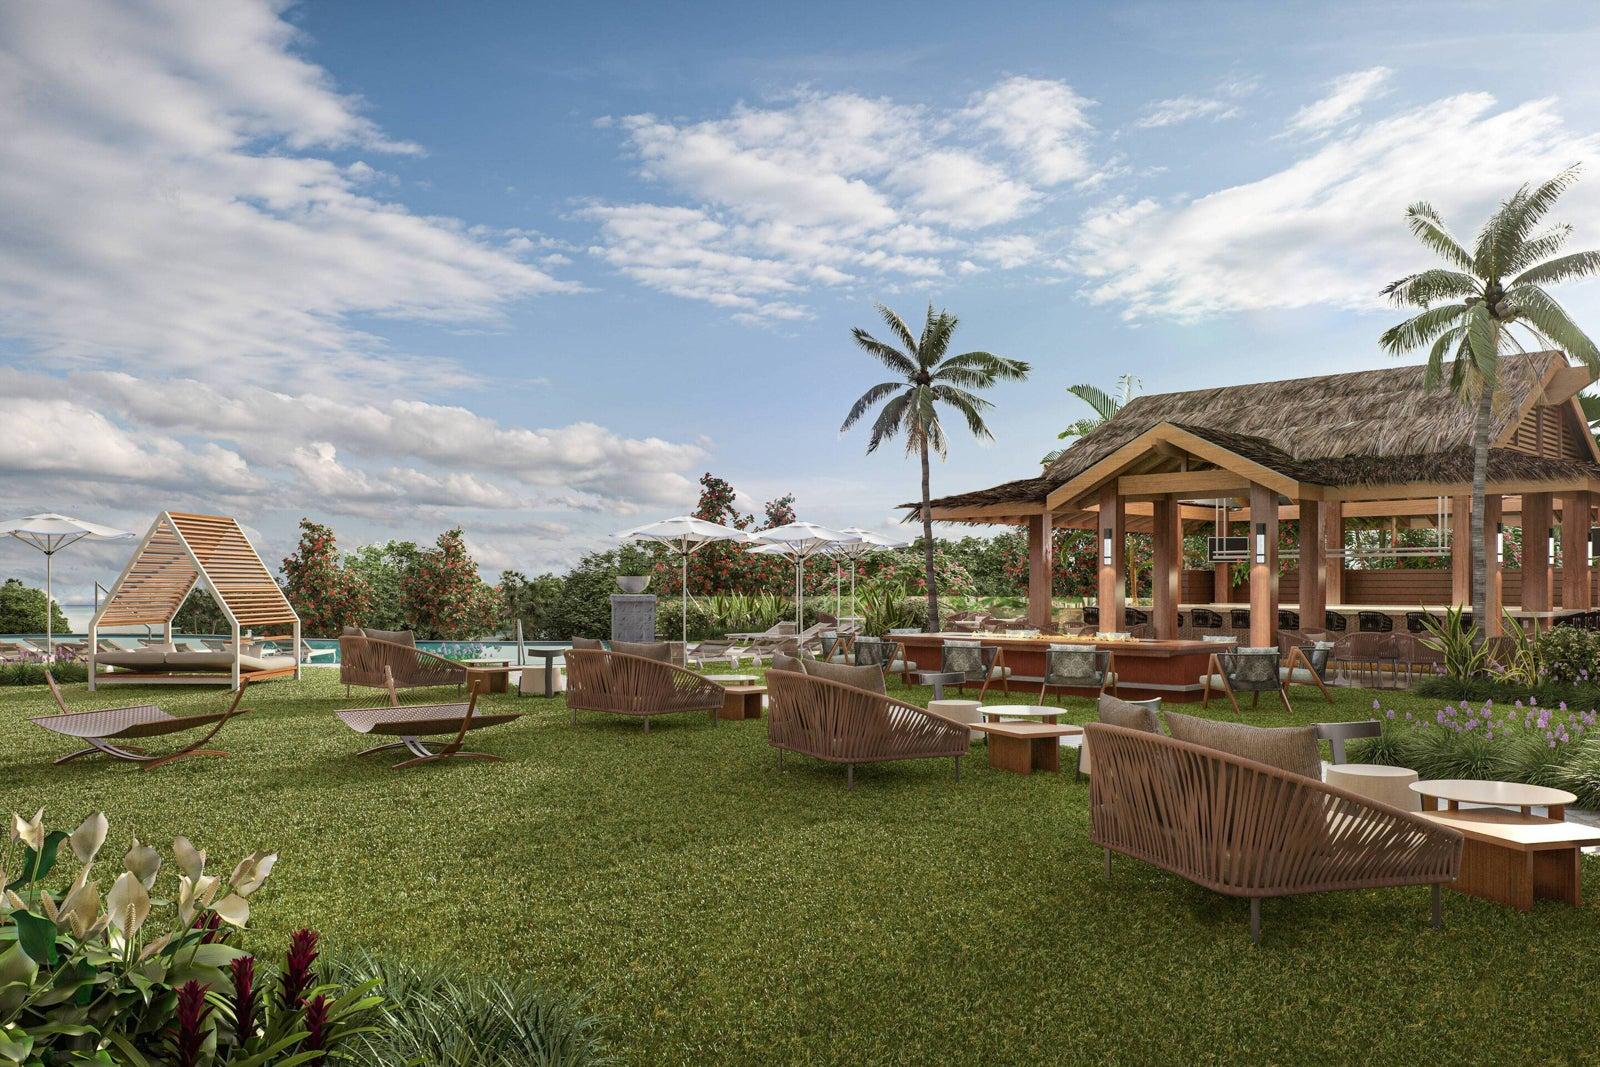 The AC Hotel Maui Wailea. (Photo courtesy of Marriott)